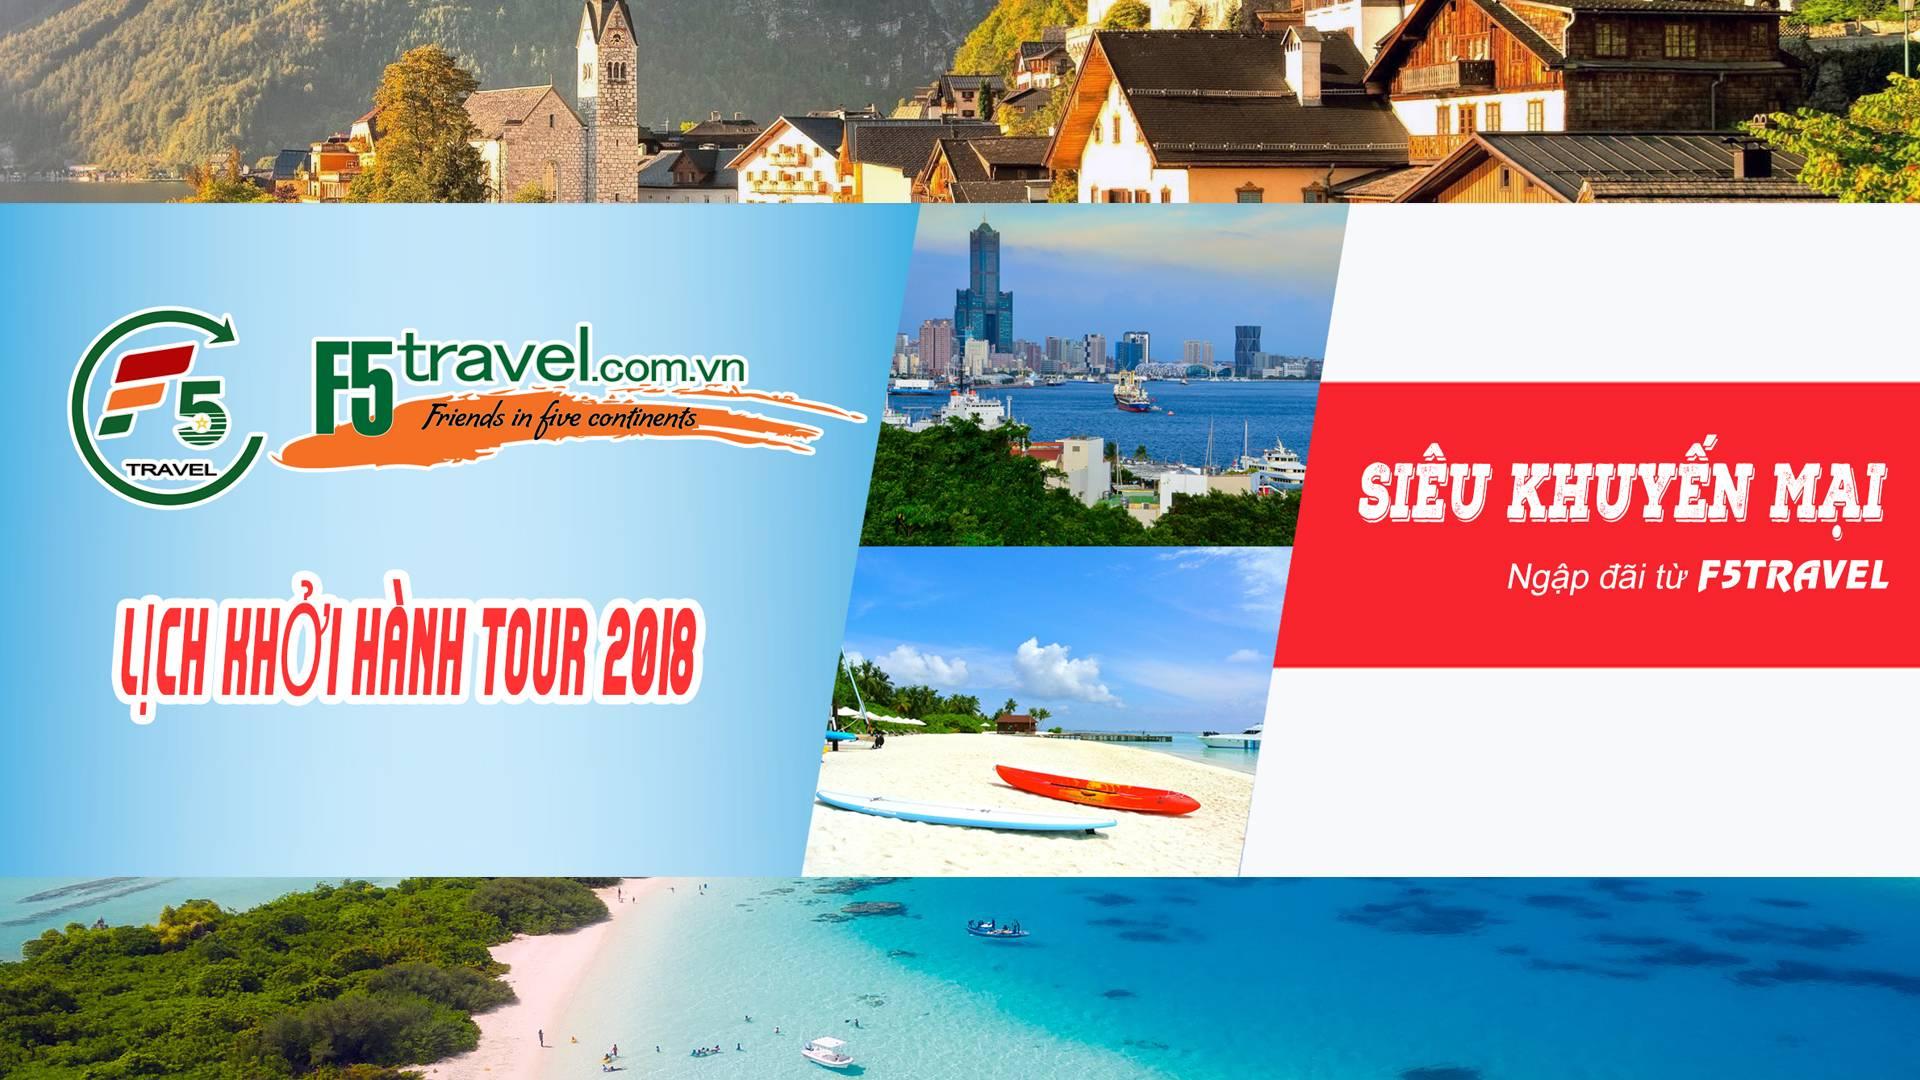 List tour 2018 1920x1080 - TRANG CHỦ